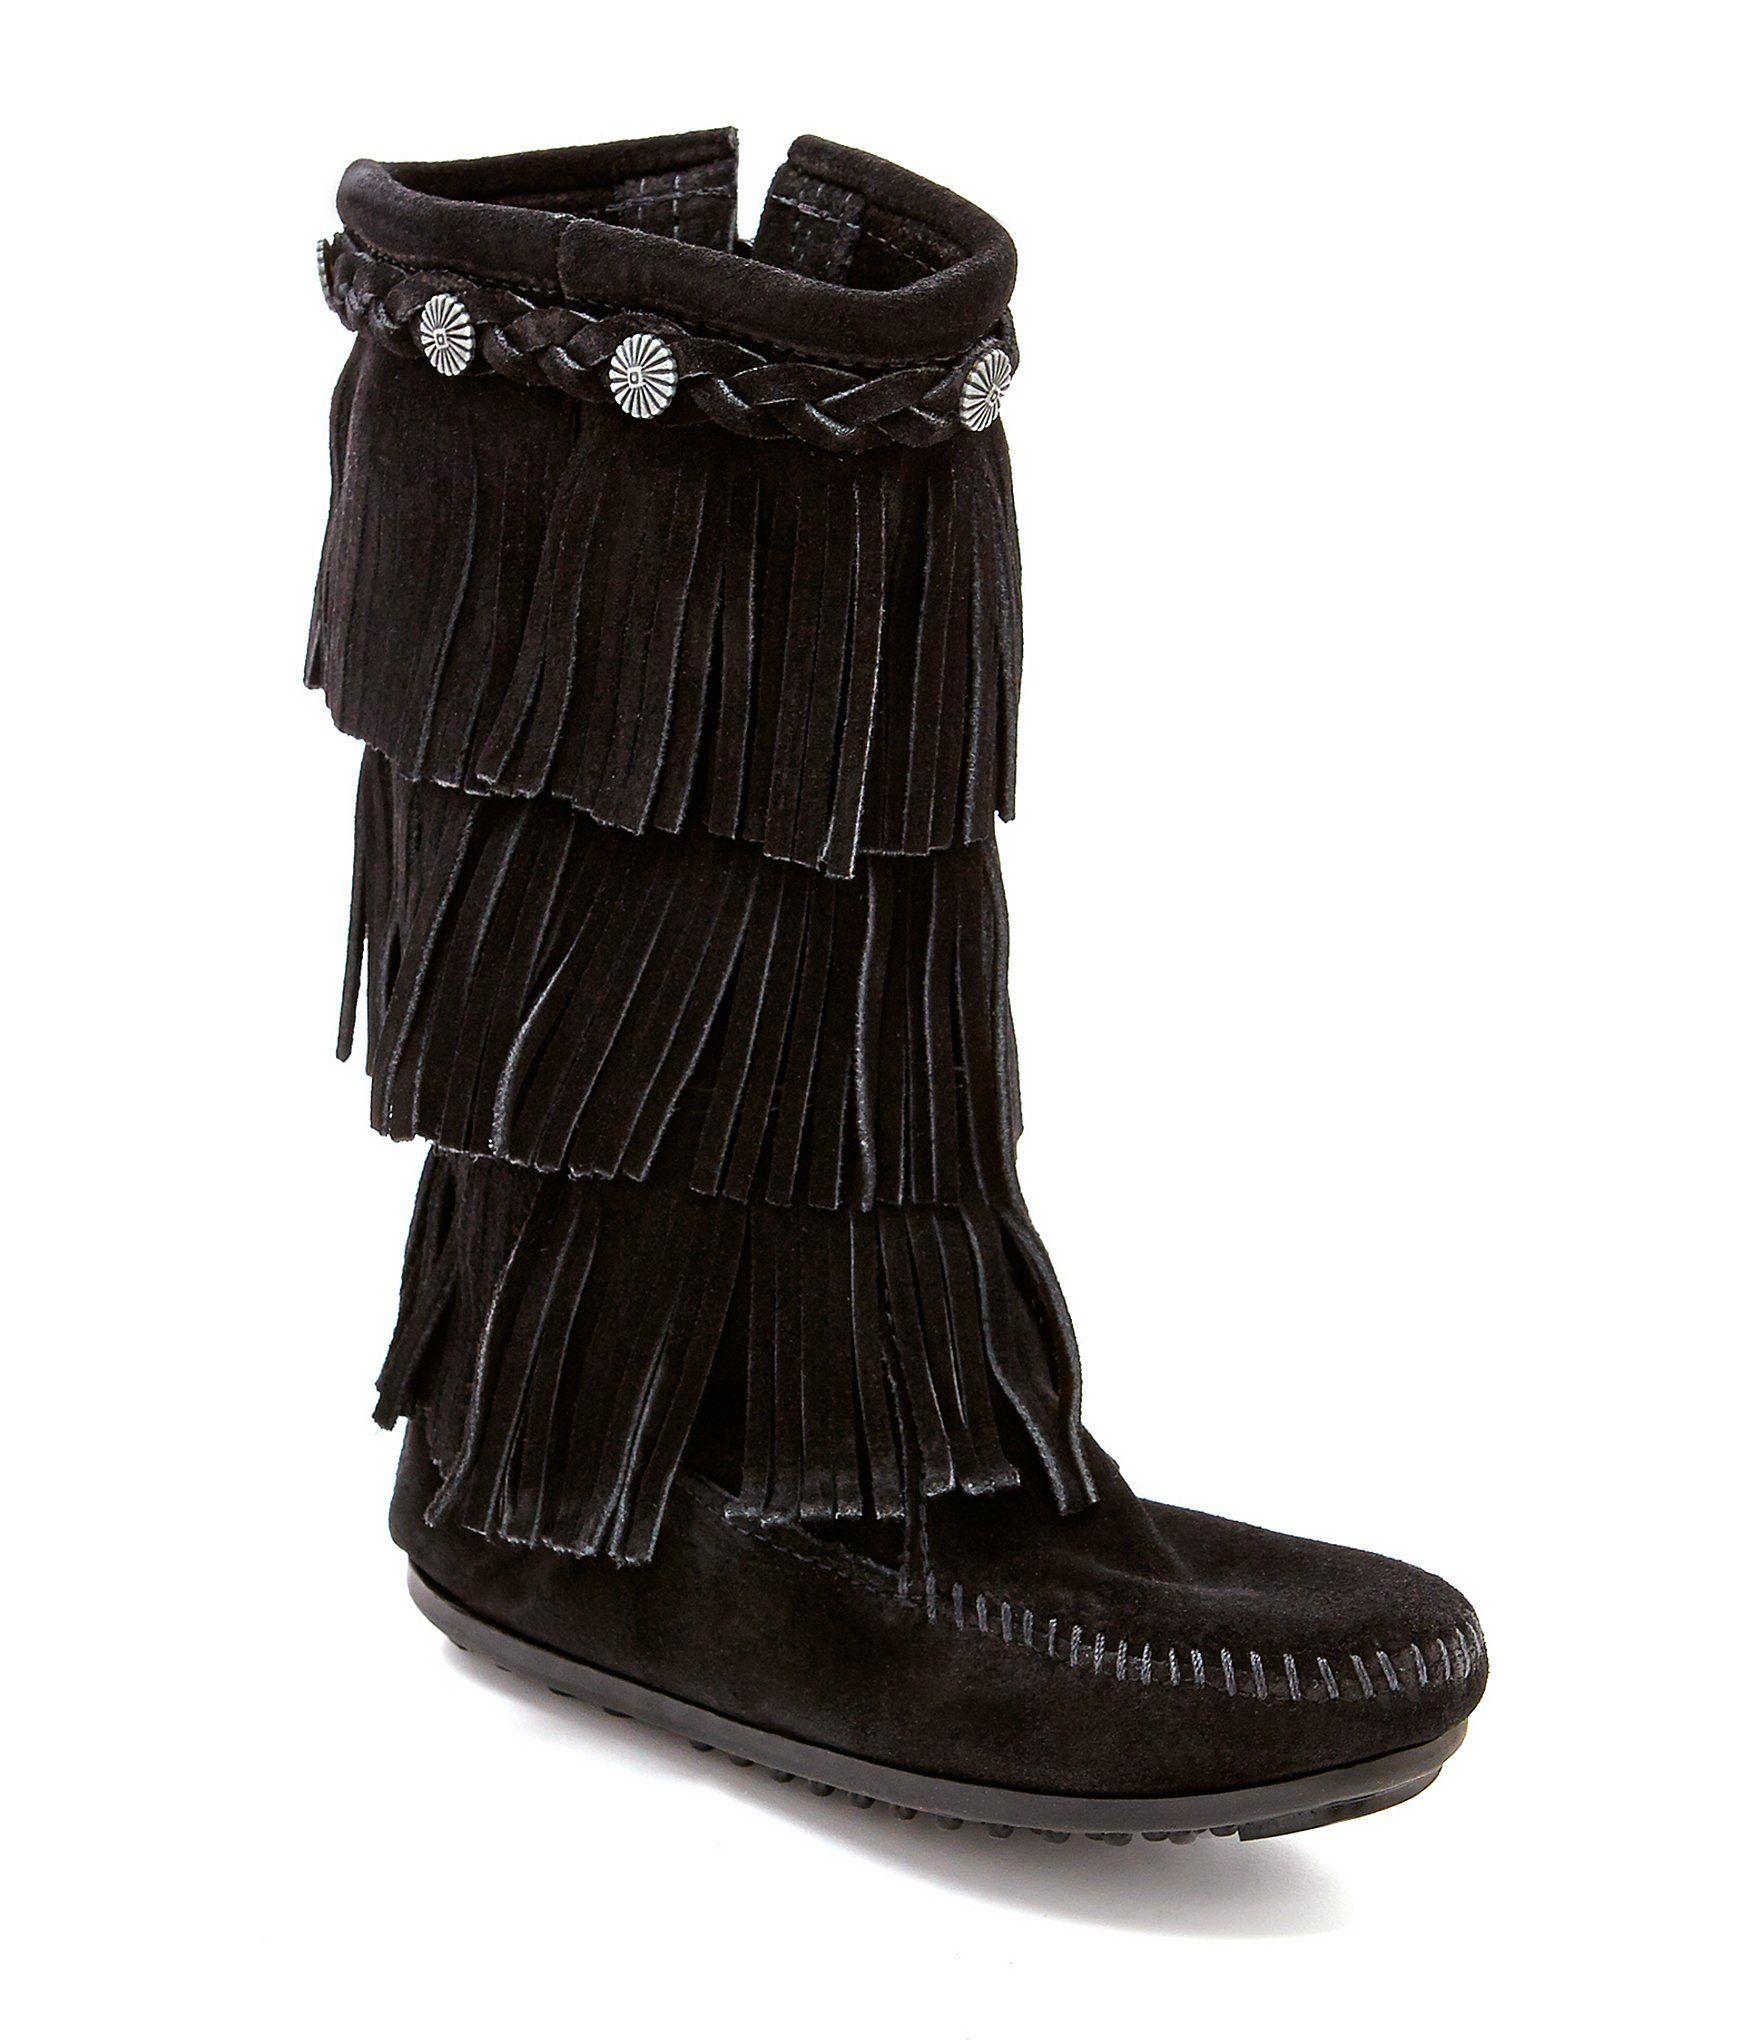 Minnetonka Girls' 3-Layer Fringe Stud Suede Boots – Black 8M Infant